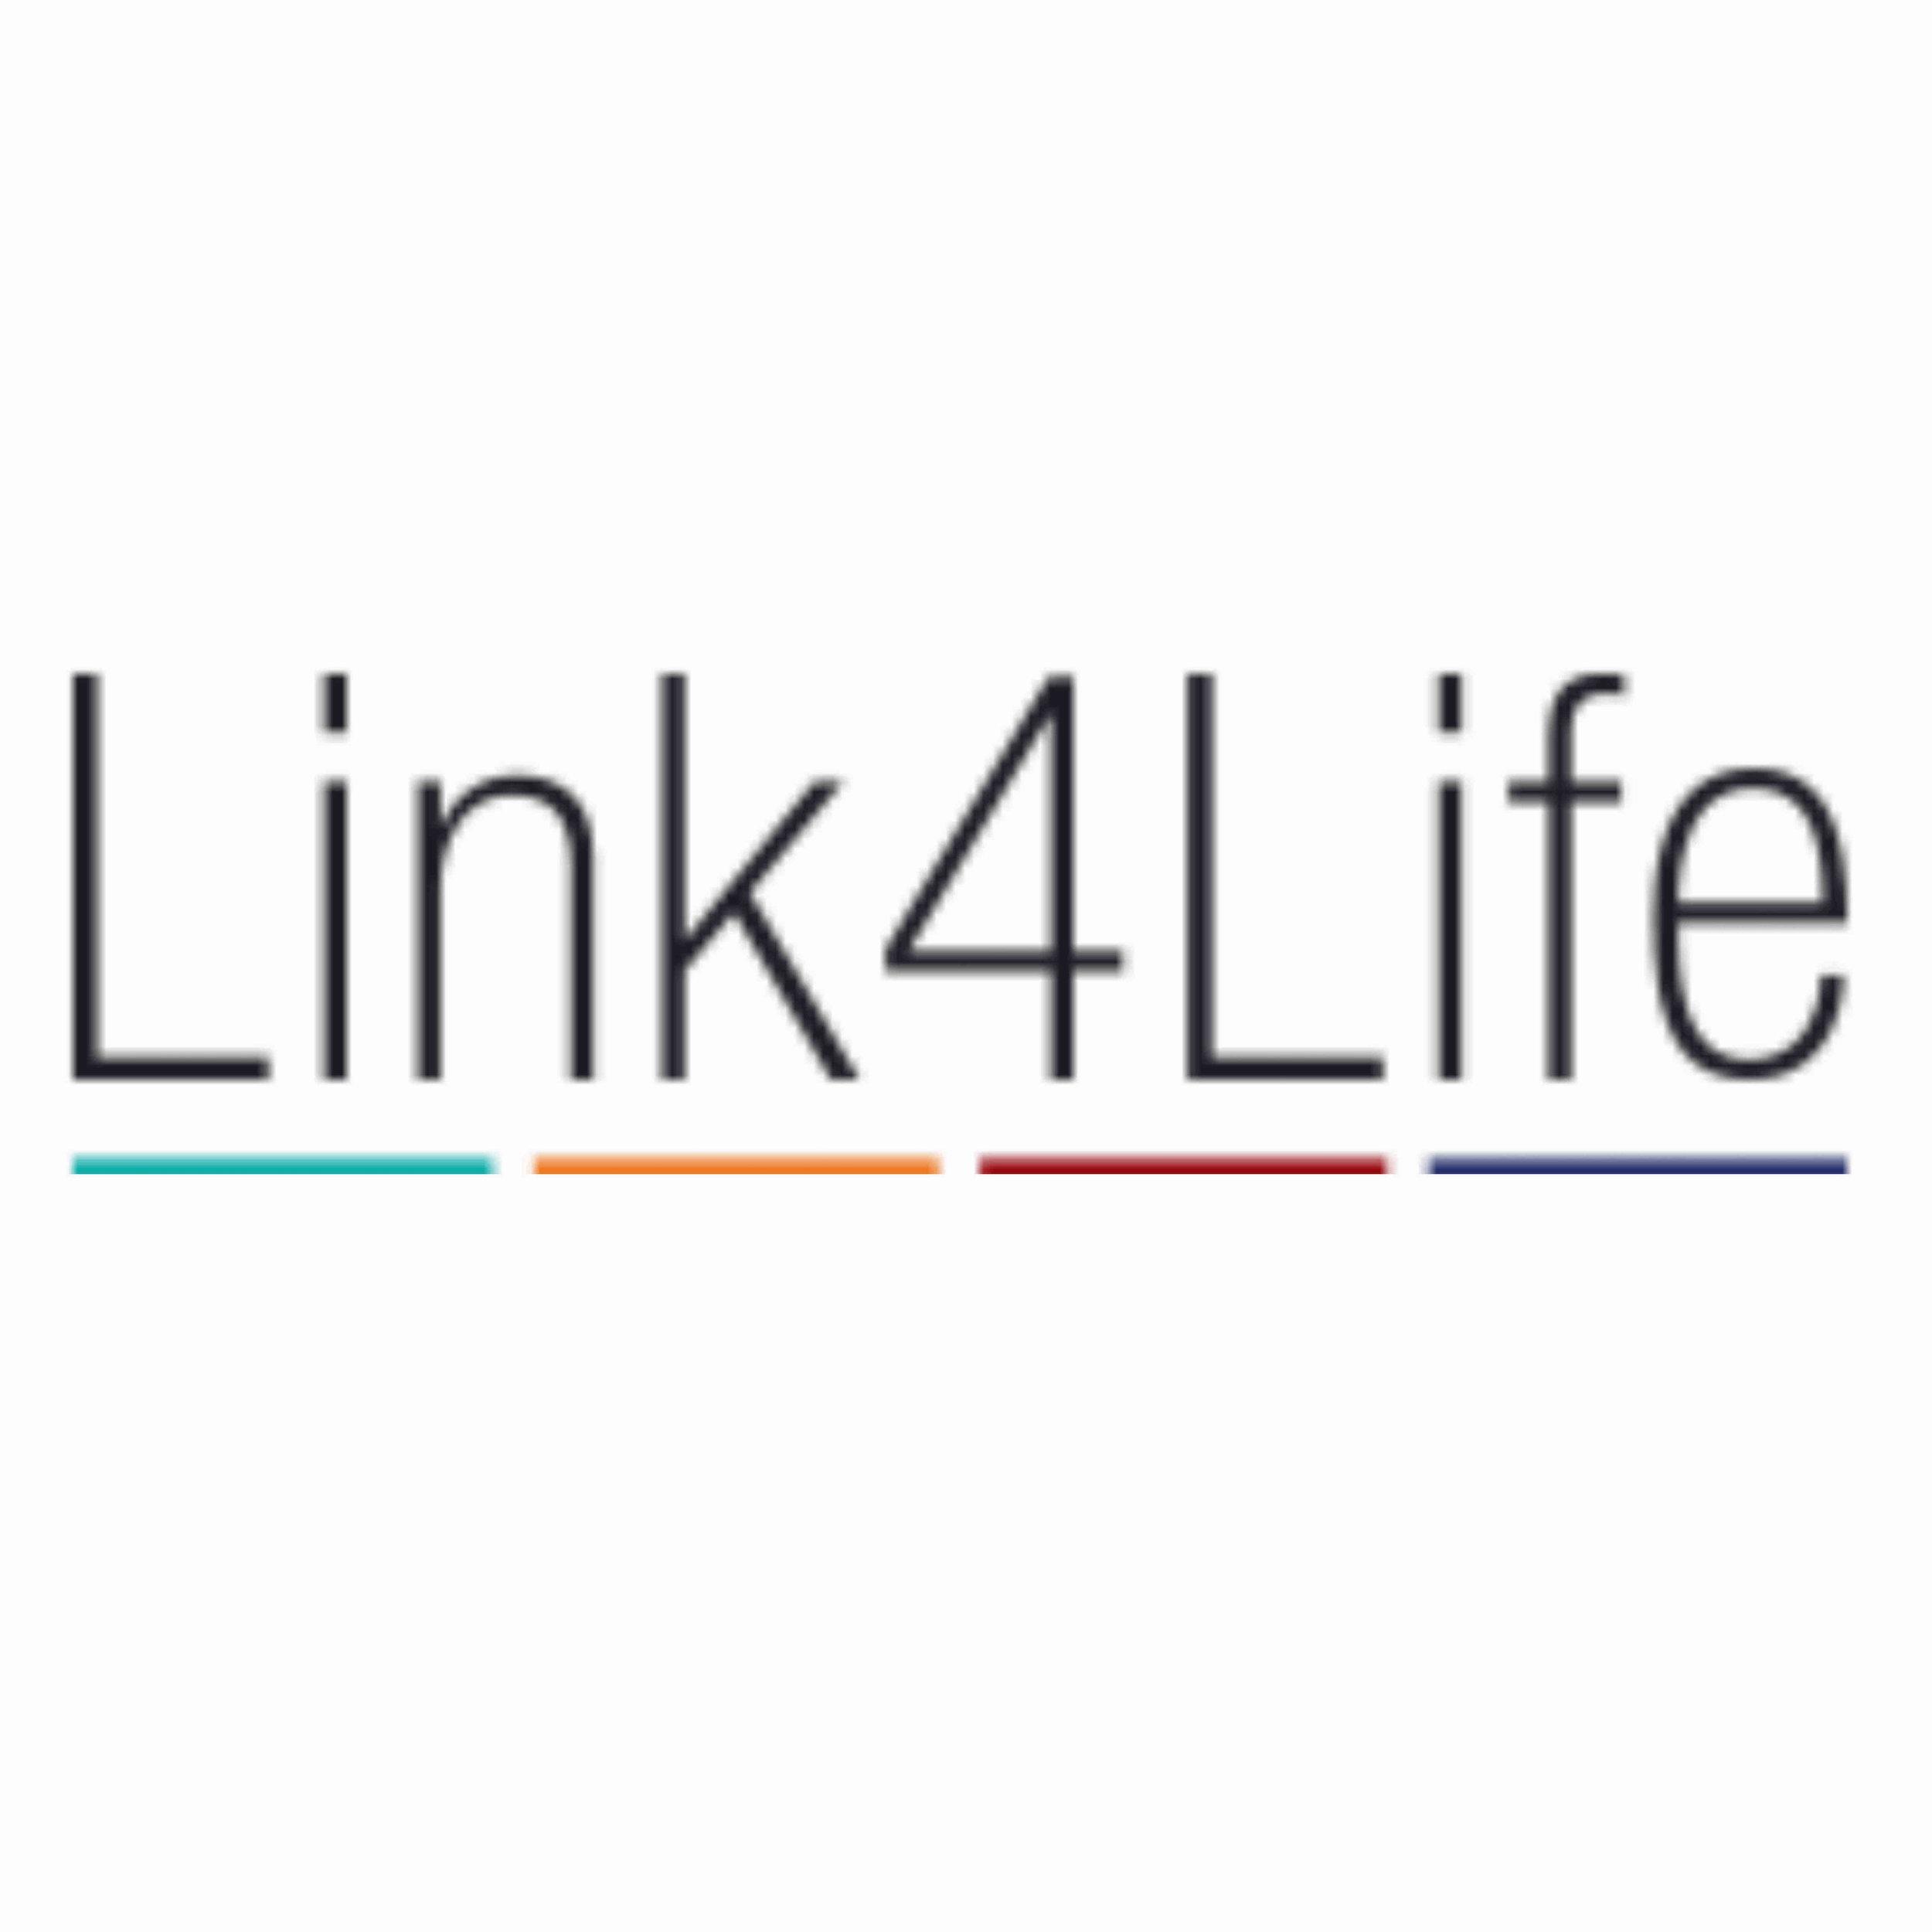 LINK4LIFE.jpg